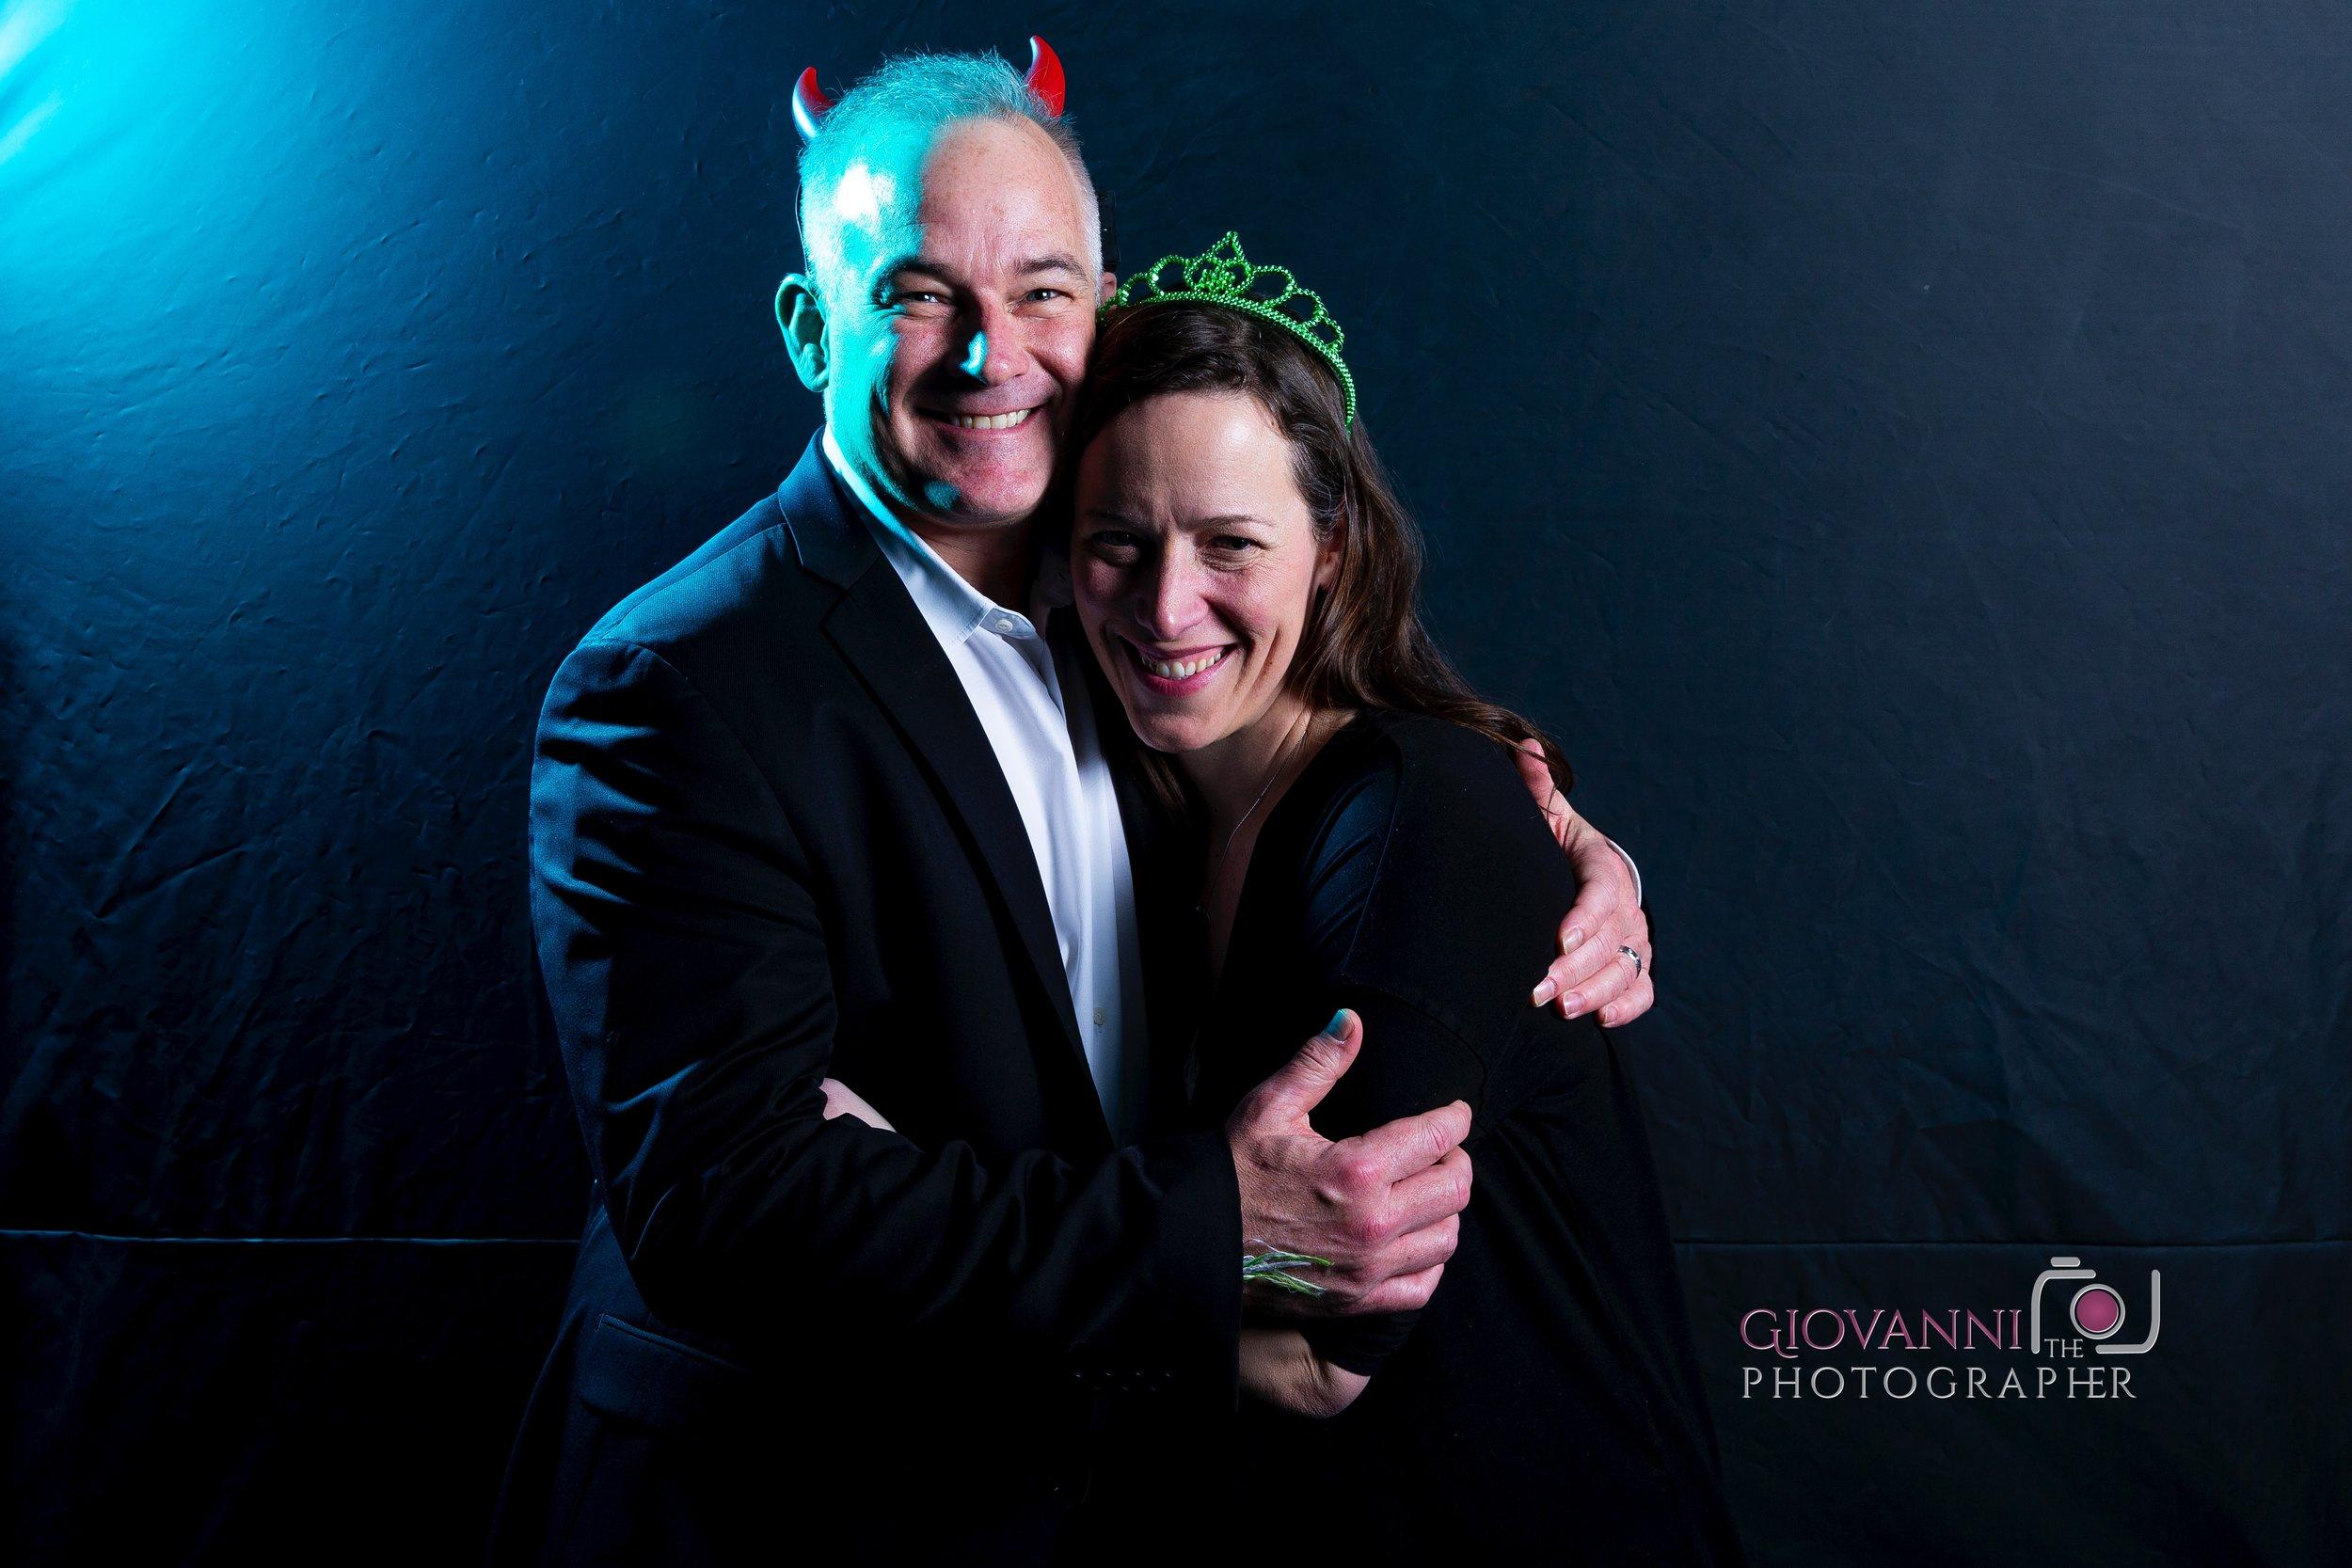 8C2A7000+Giovanni The Photographer+Best Boston Photo Booth Rental+Event+Scholars Boston WM100.jpg